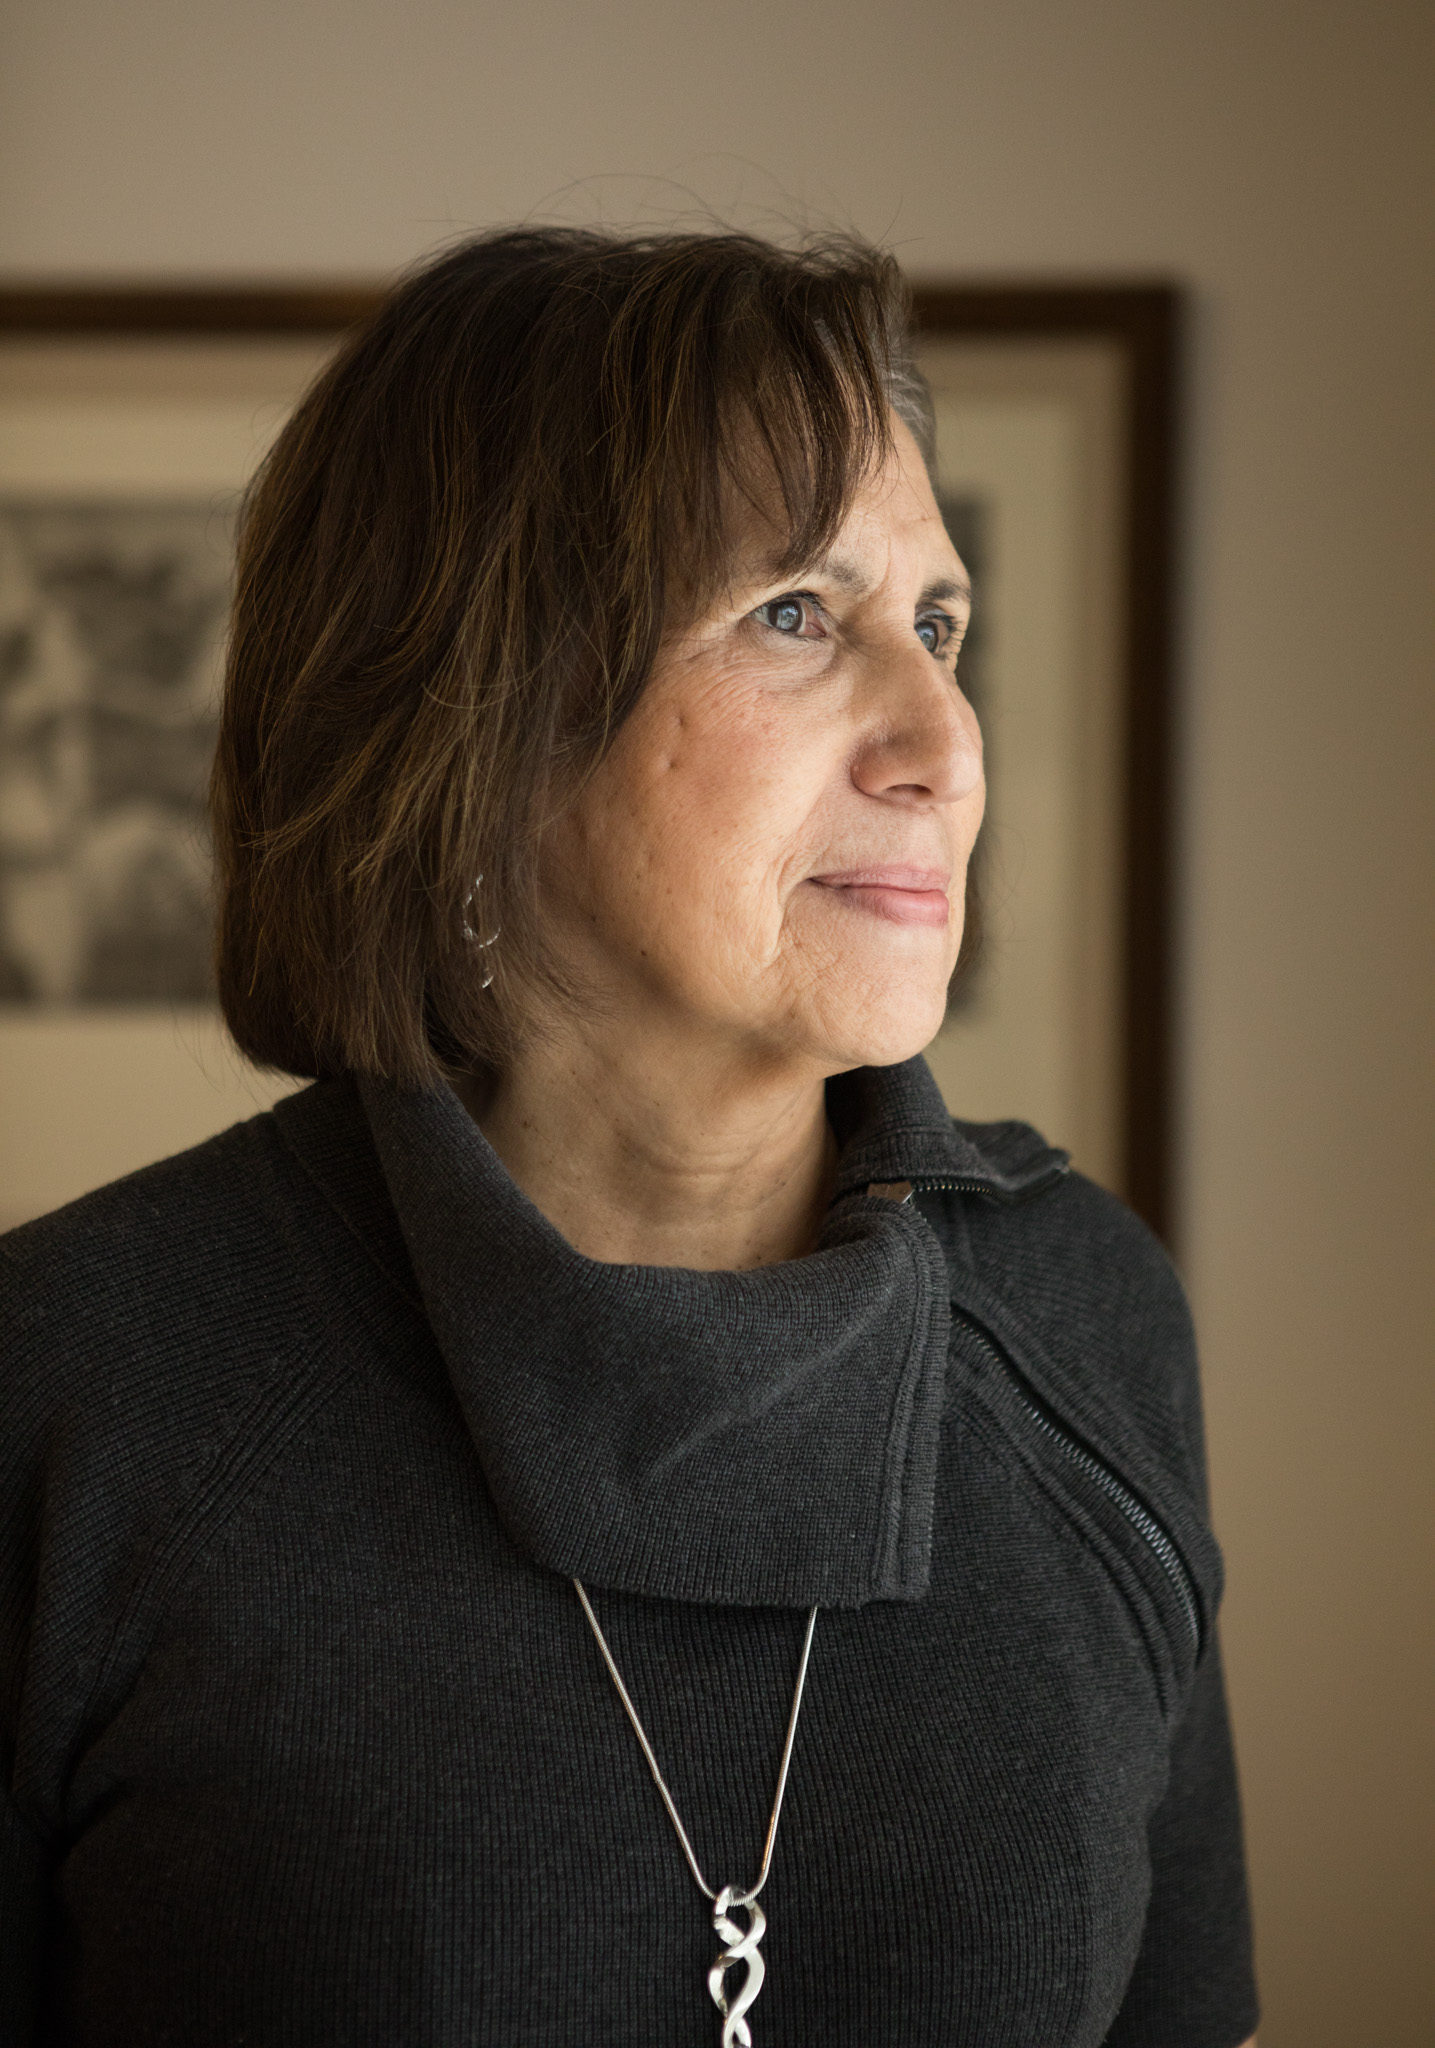 National Association of Latino Arts and Cultures (NALAC) President and CEO María López De Léon